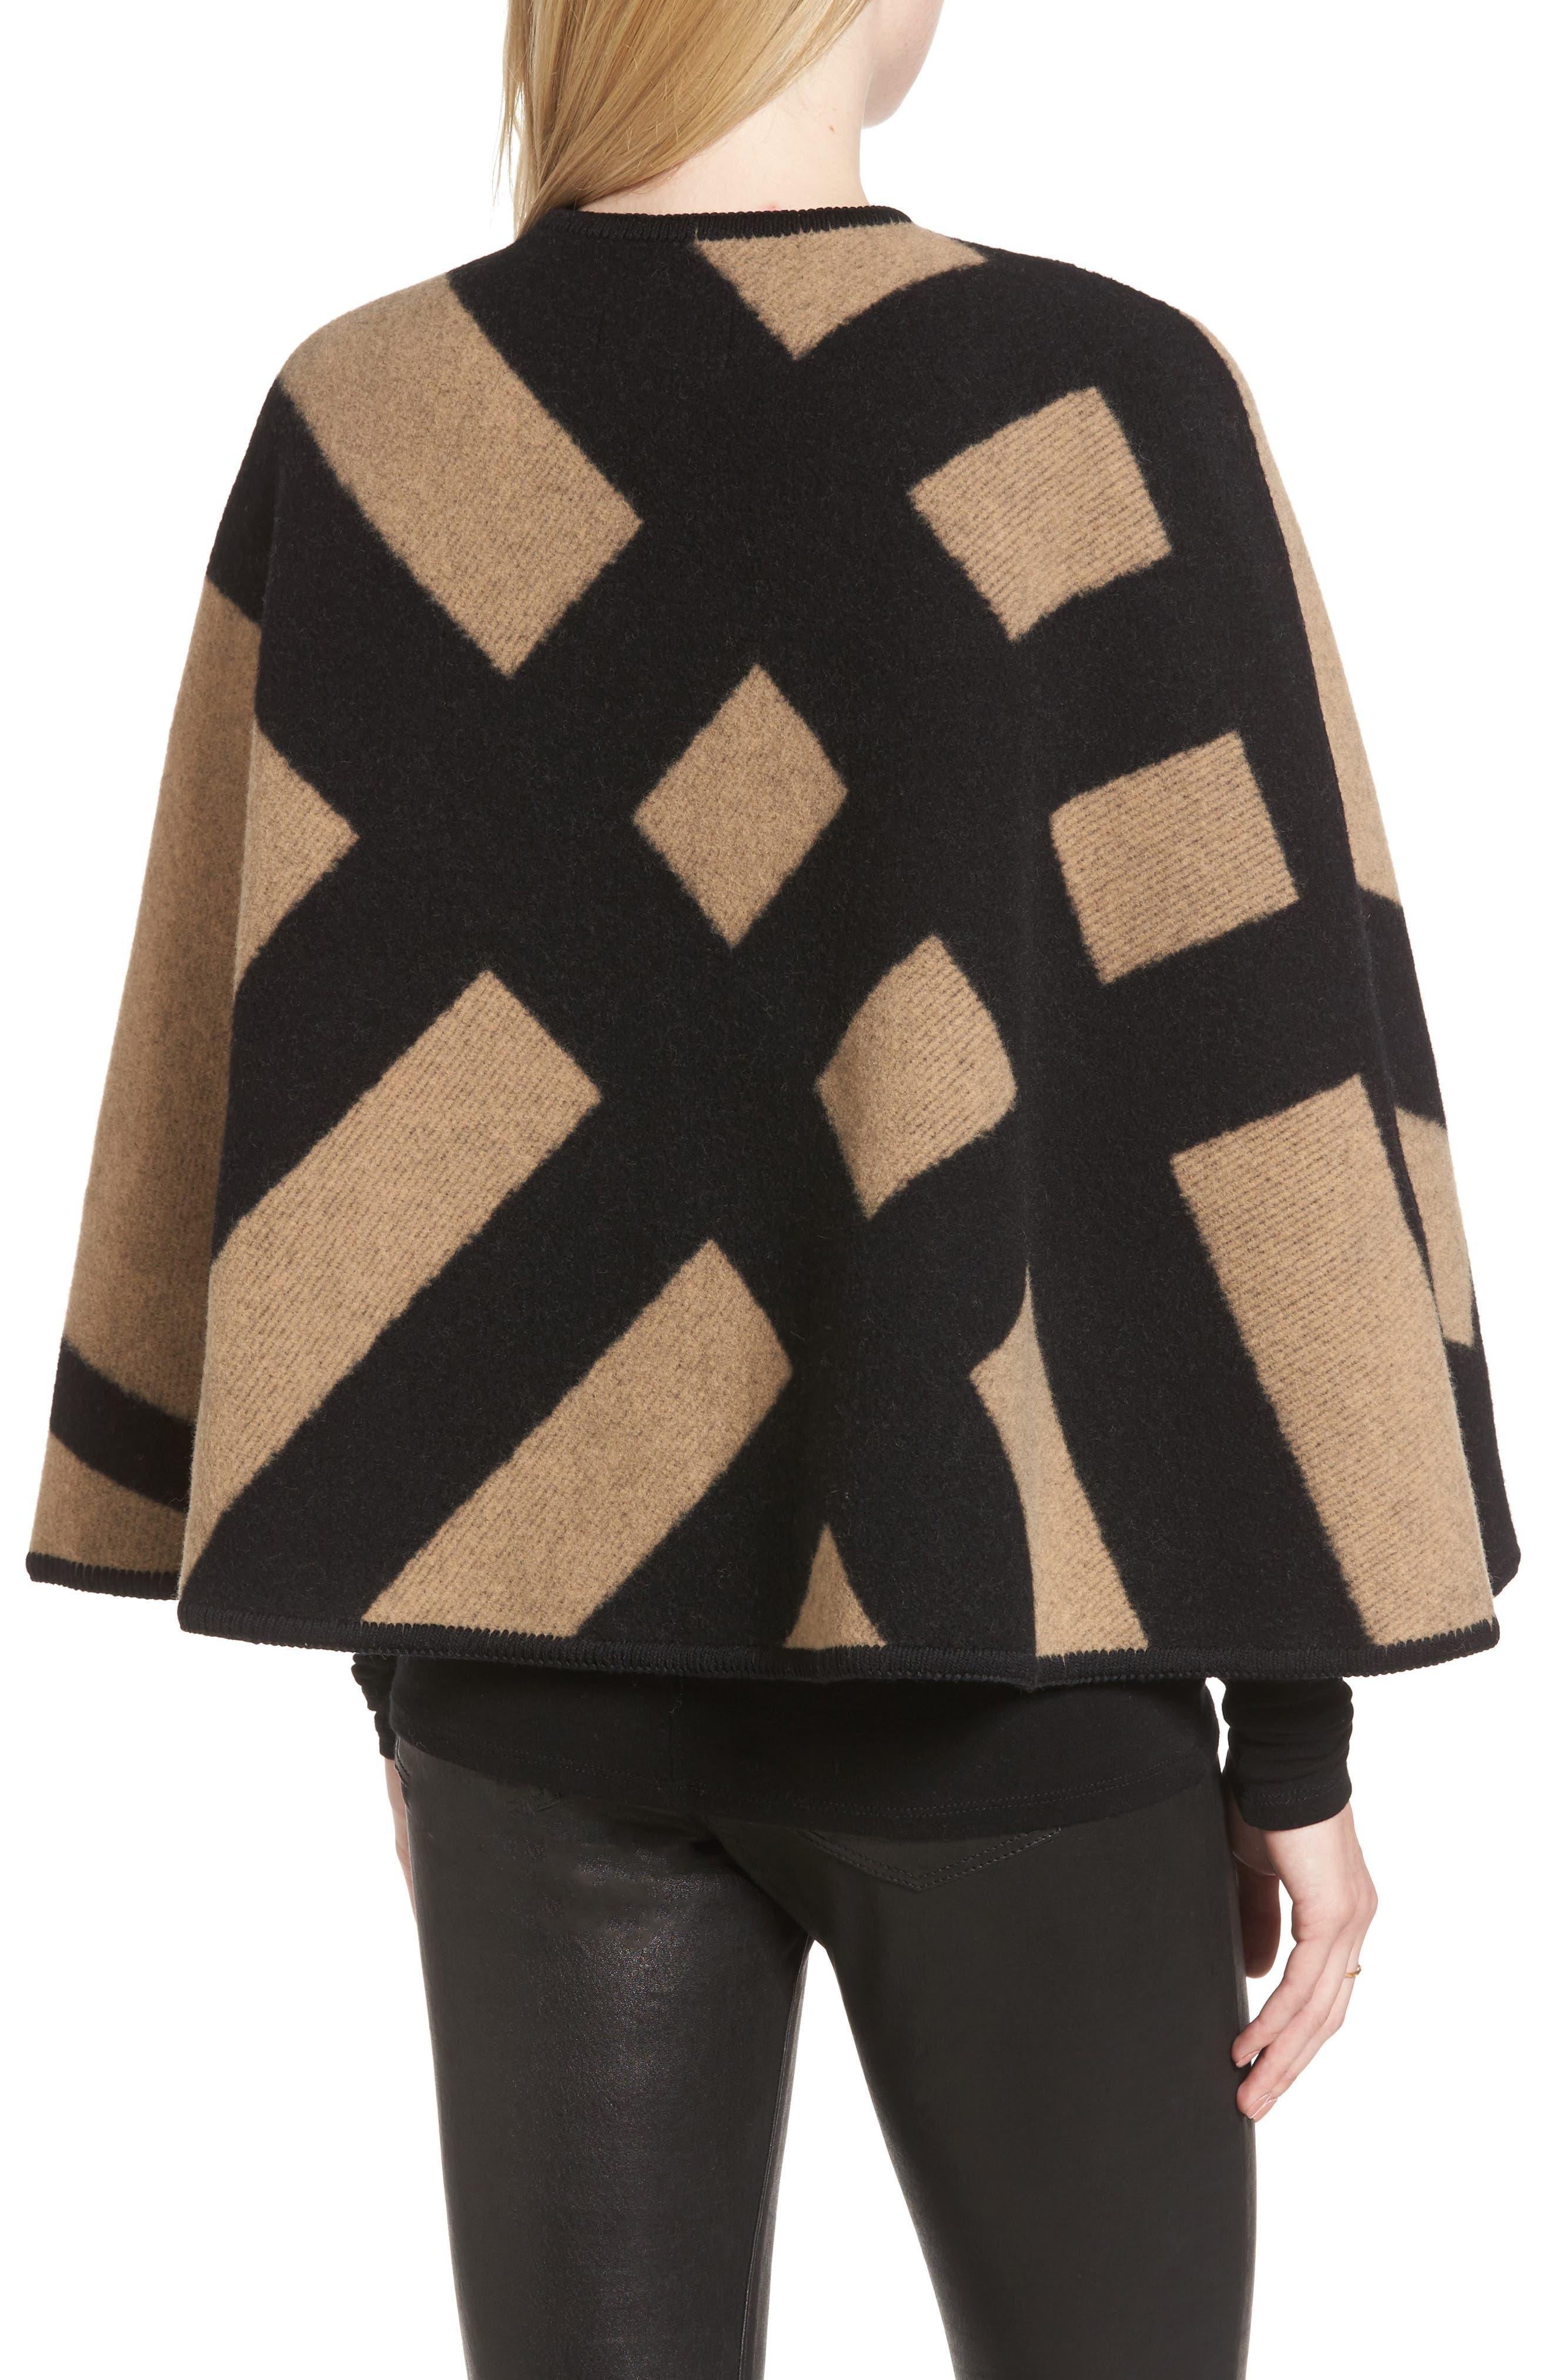 Blanket Check Wool & Cashmere Poncho,                             Alternate thumbnail 2, color,                             CAMEL/ BLACK